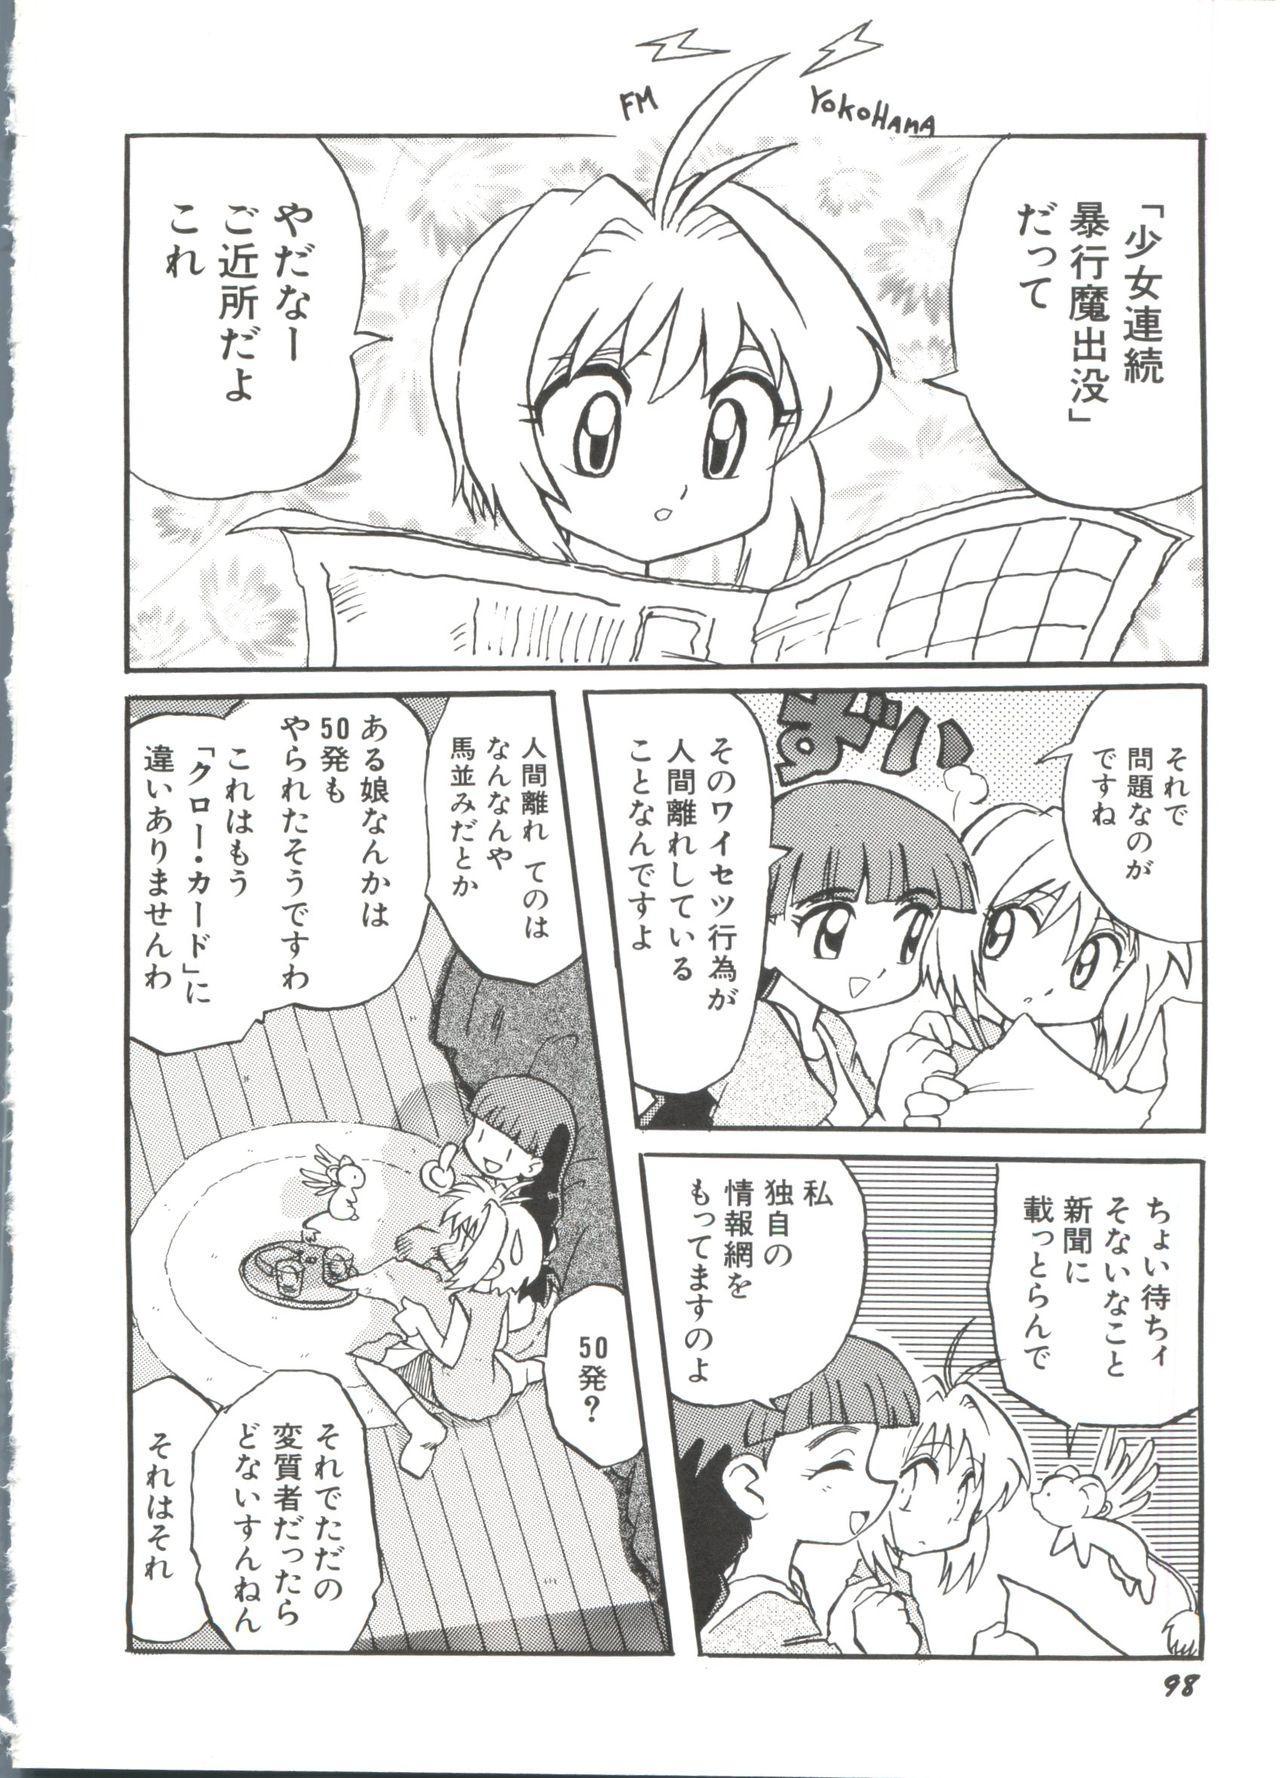 [Anthology] Denei Tamatebako 8 - Utakata no Tenshi-tachi II (Various) 99